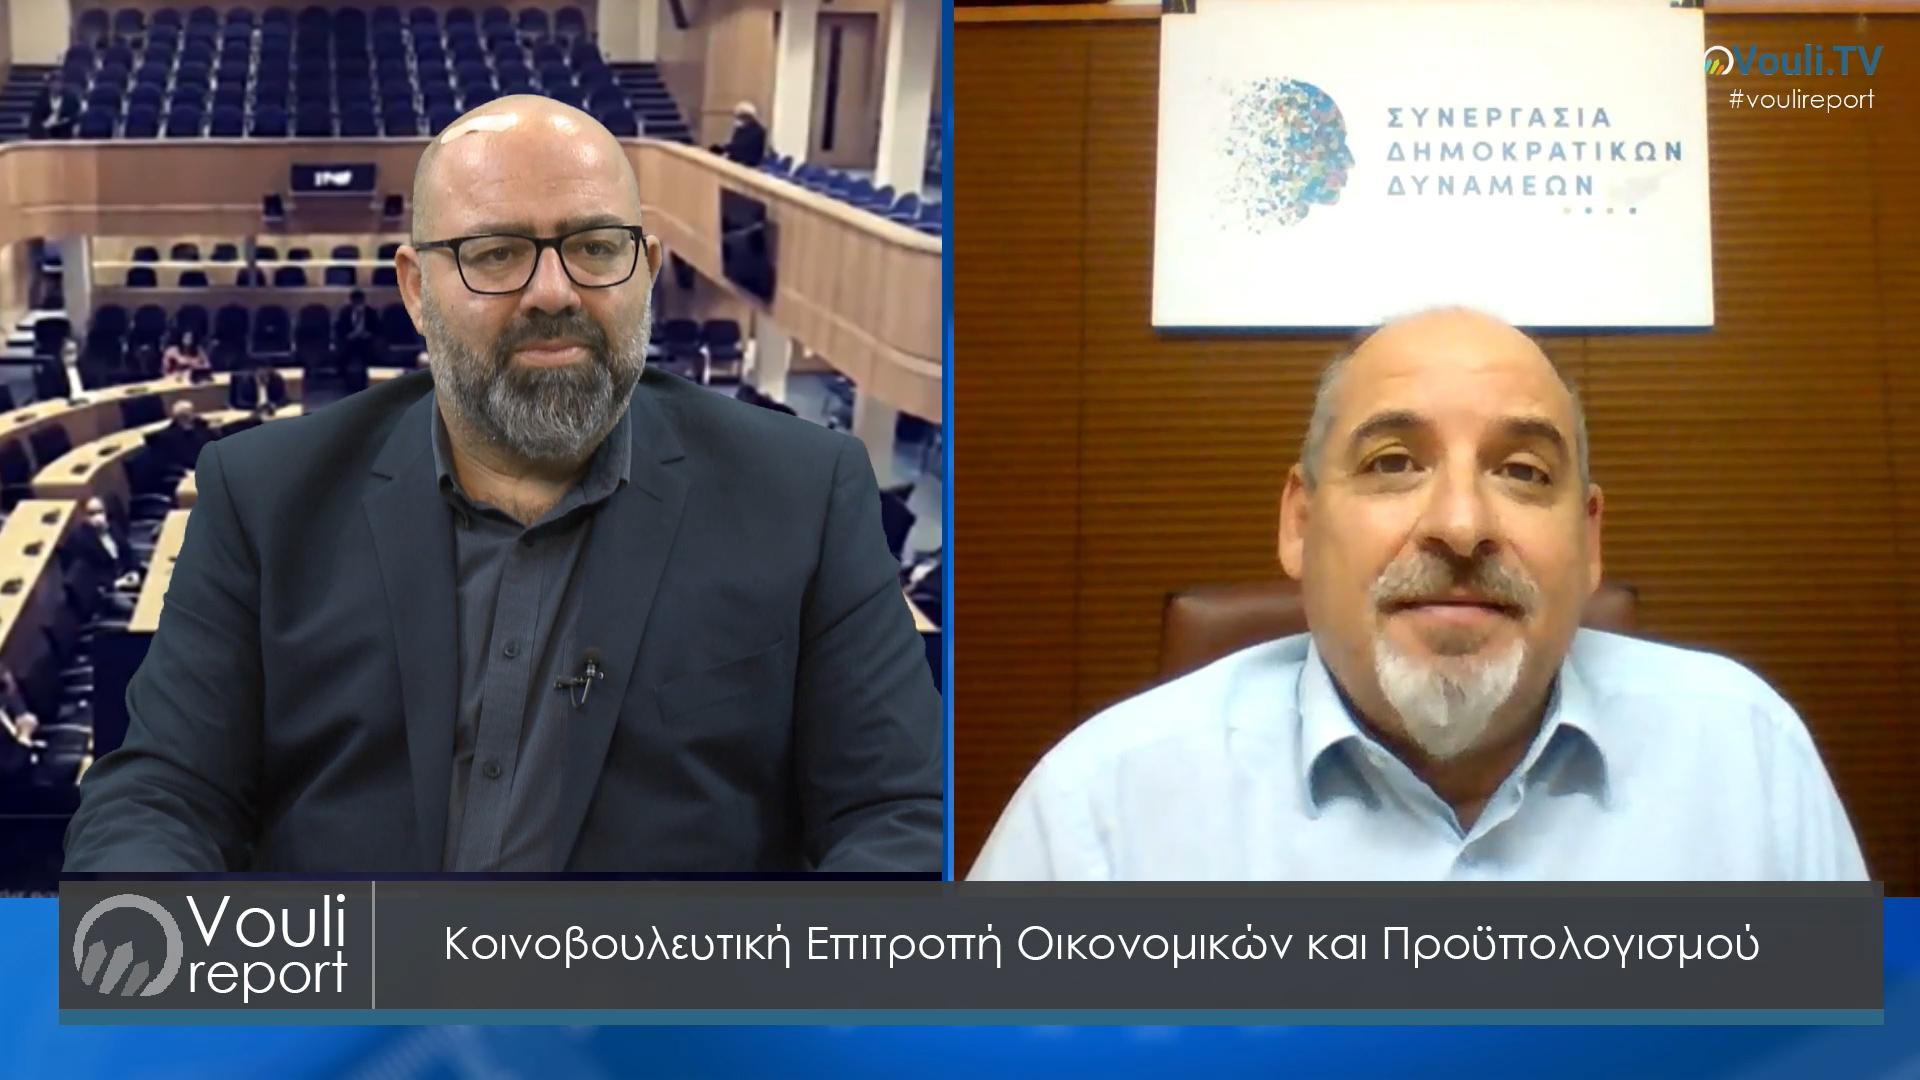 Vouli report - 07/12/2020   Κοινοβουλευτική Επιτροπή Οικονομικών και Προϋπολογισμού